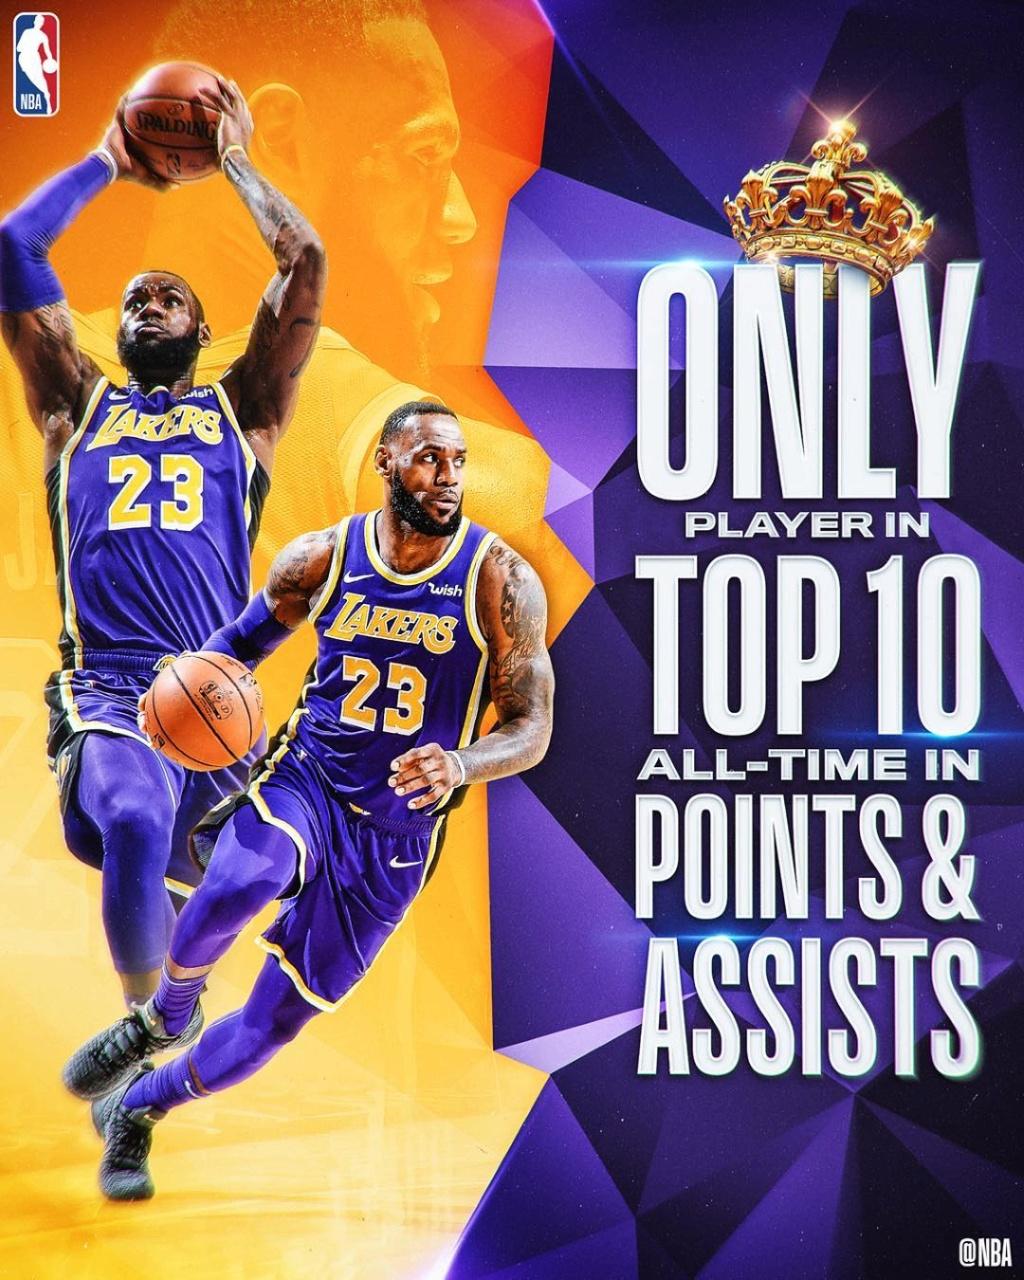 [BASKETBALL] Le topic officiel de la NBA - Page 28 51752510